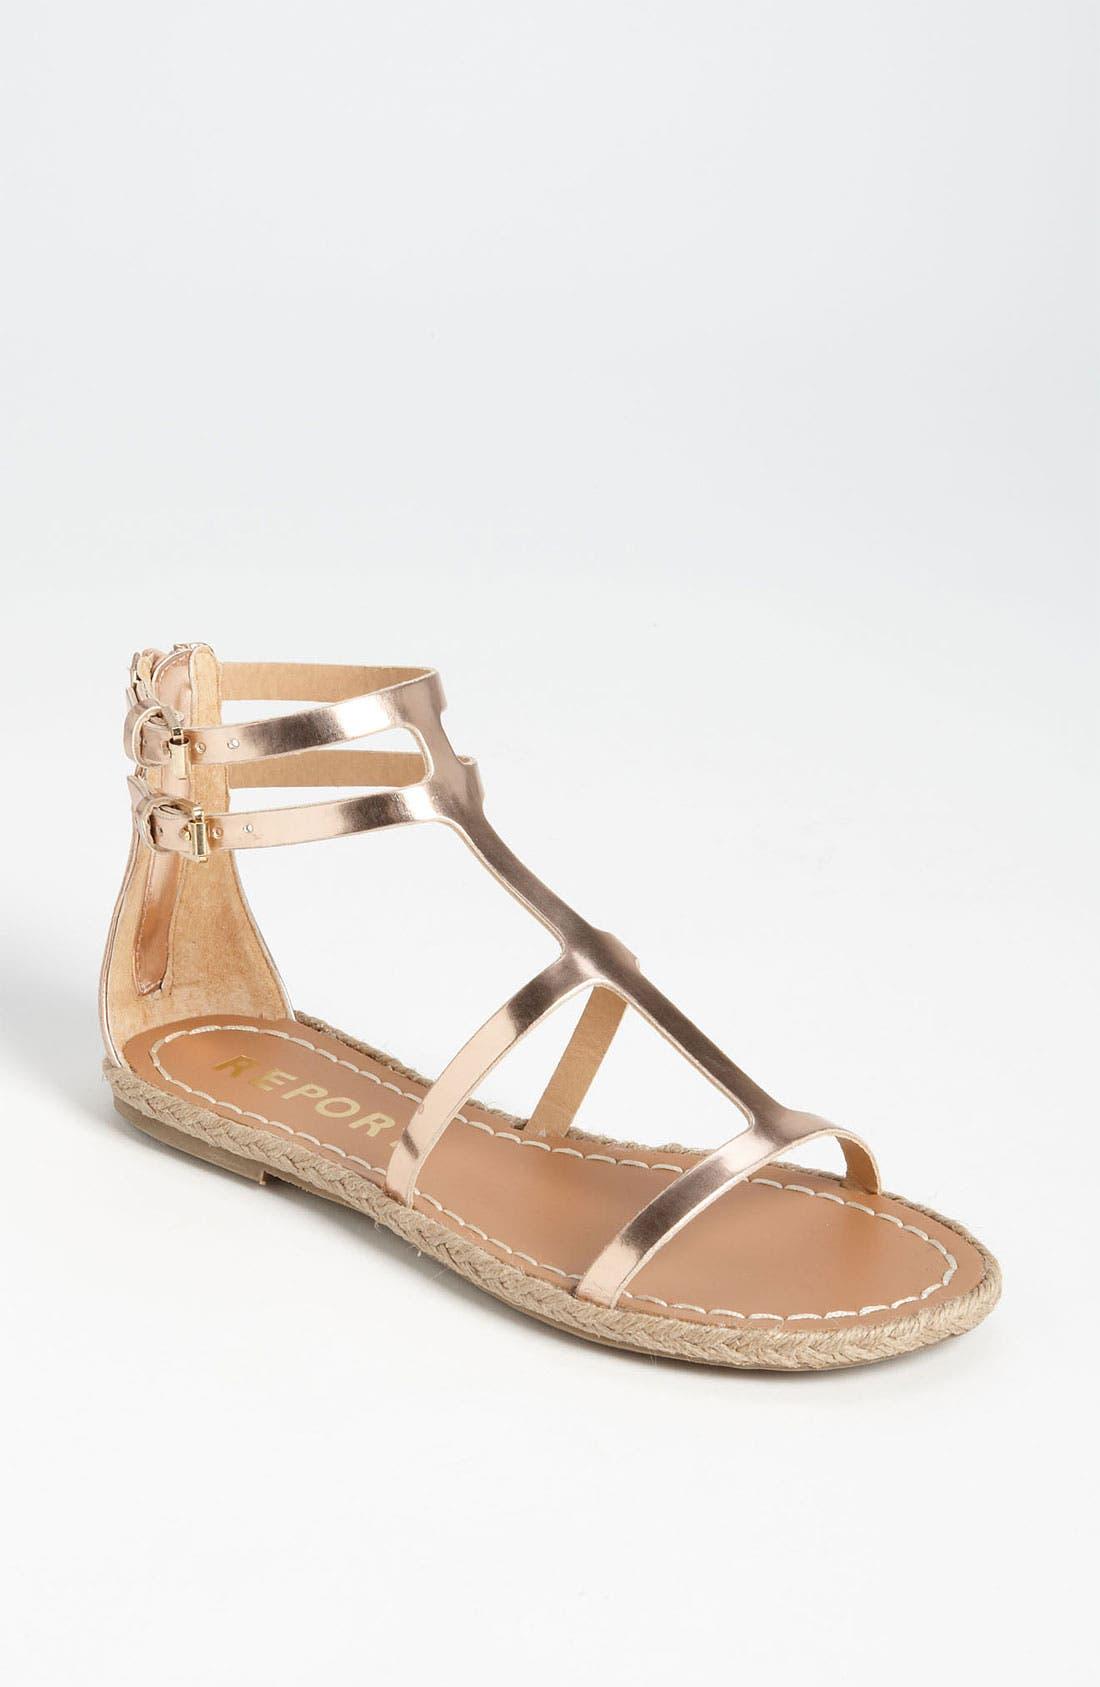 Alternate Image 1 Selected - Report 'Mazur' Sandal